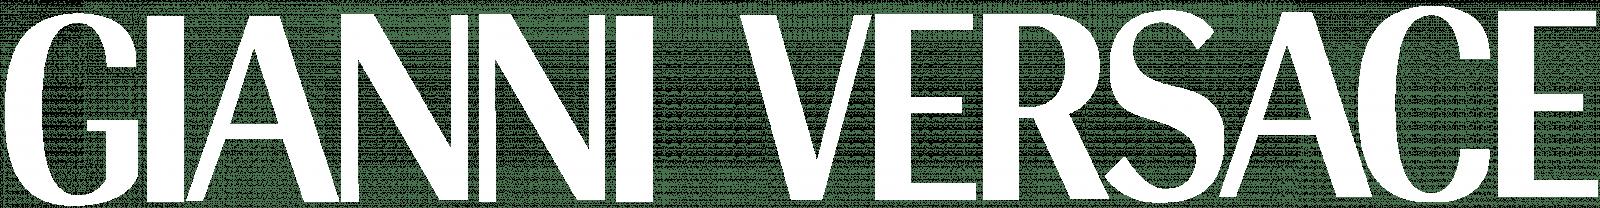 gianni-versace